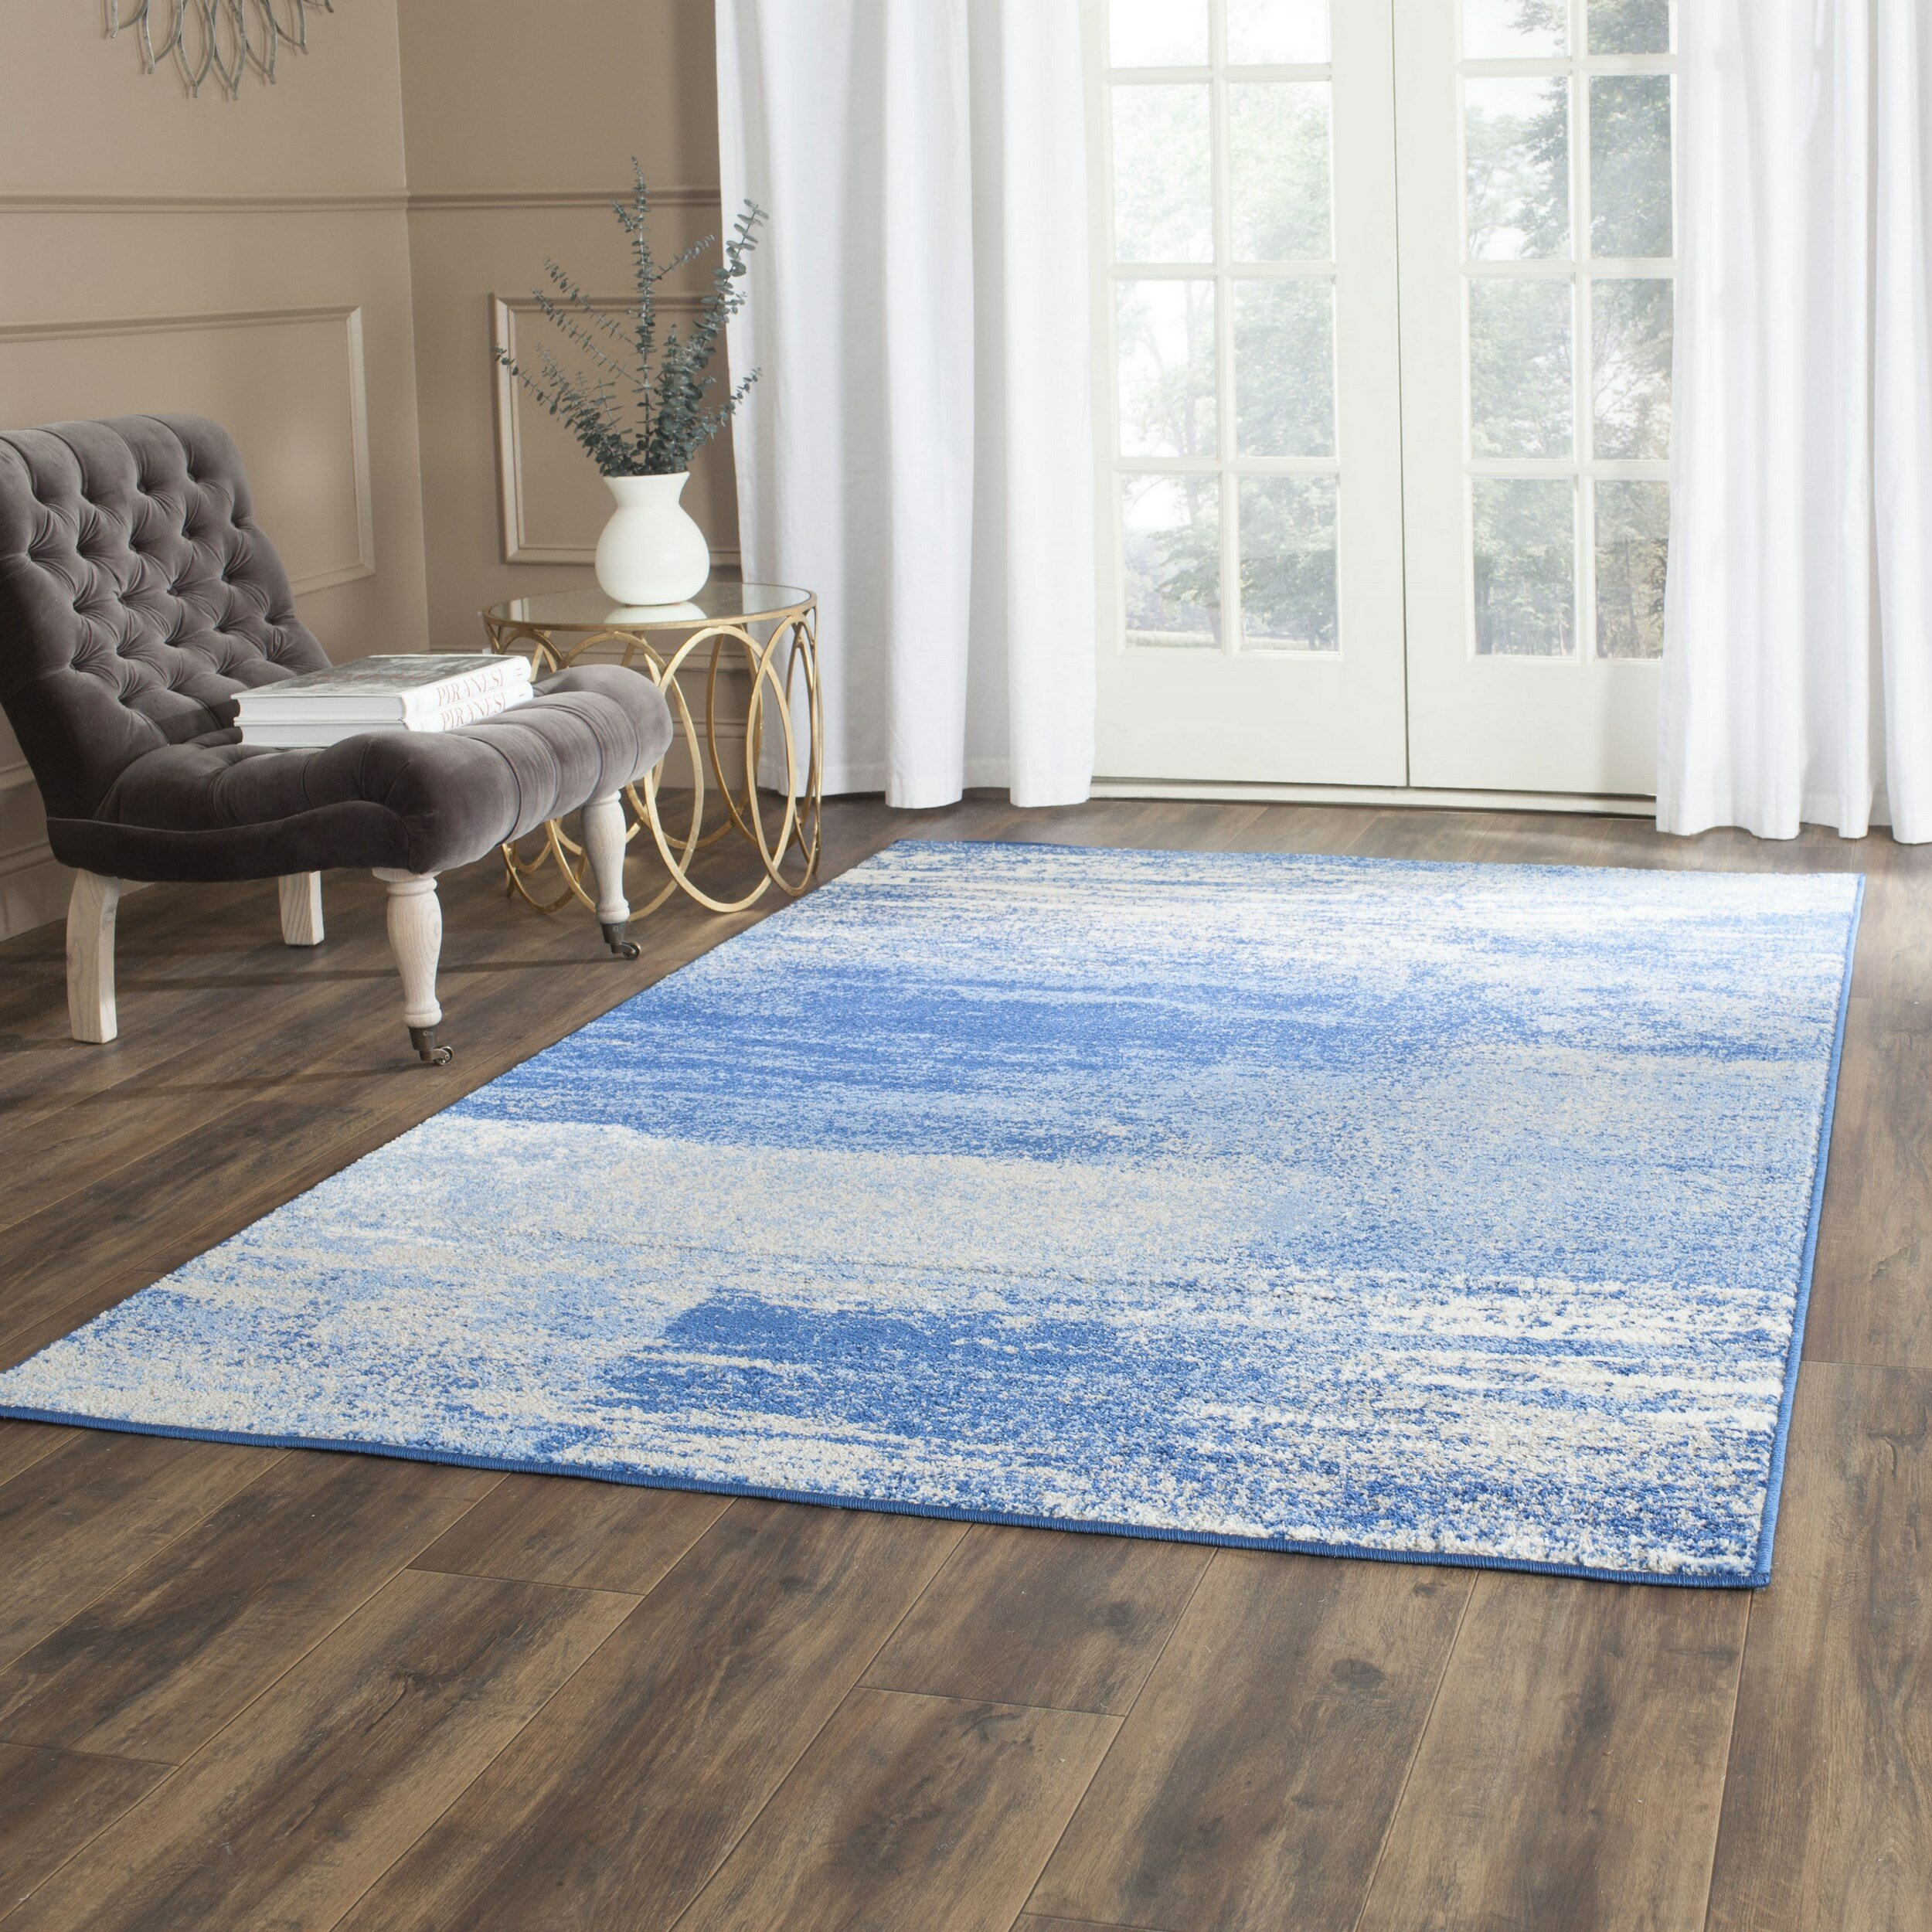 Trent austin design costa mesa silverblue area rug